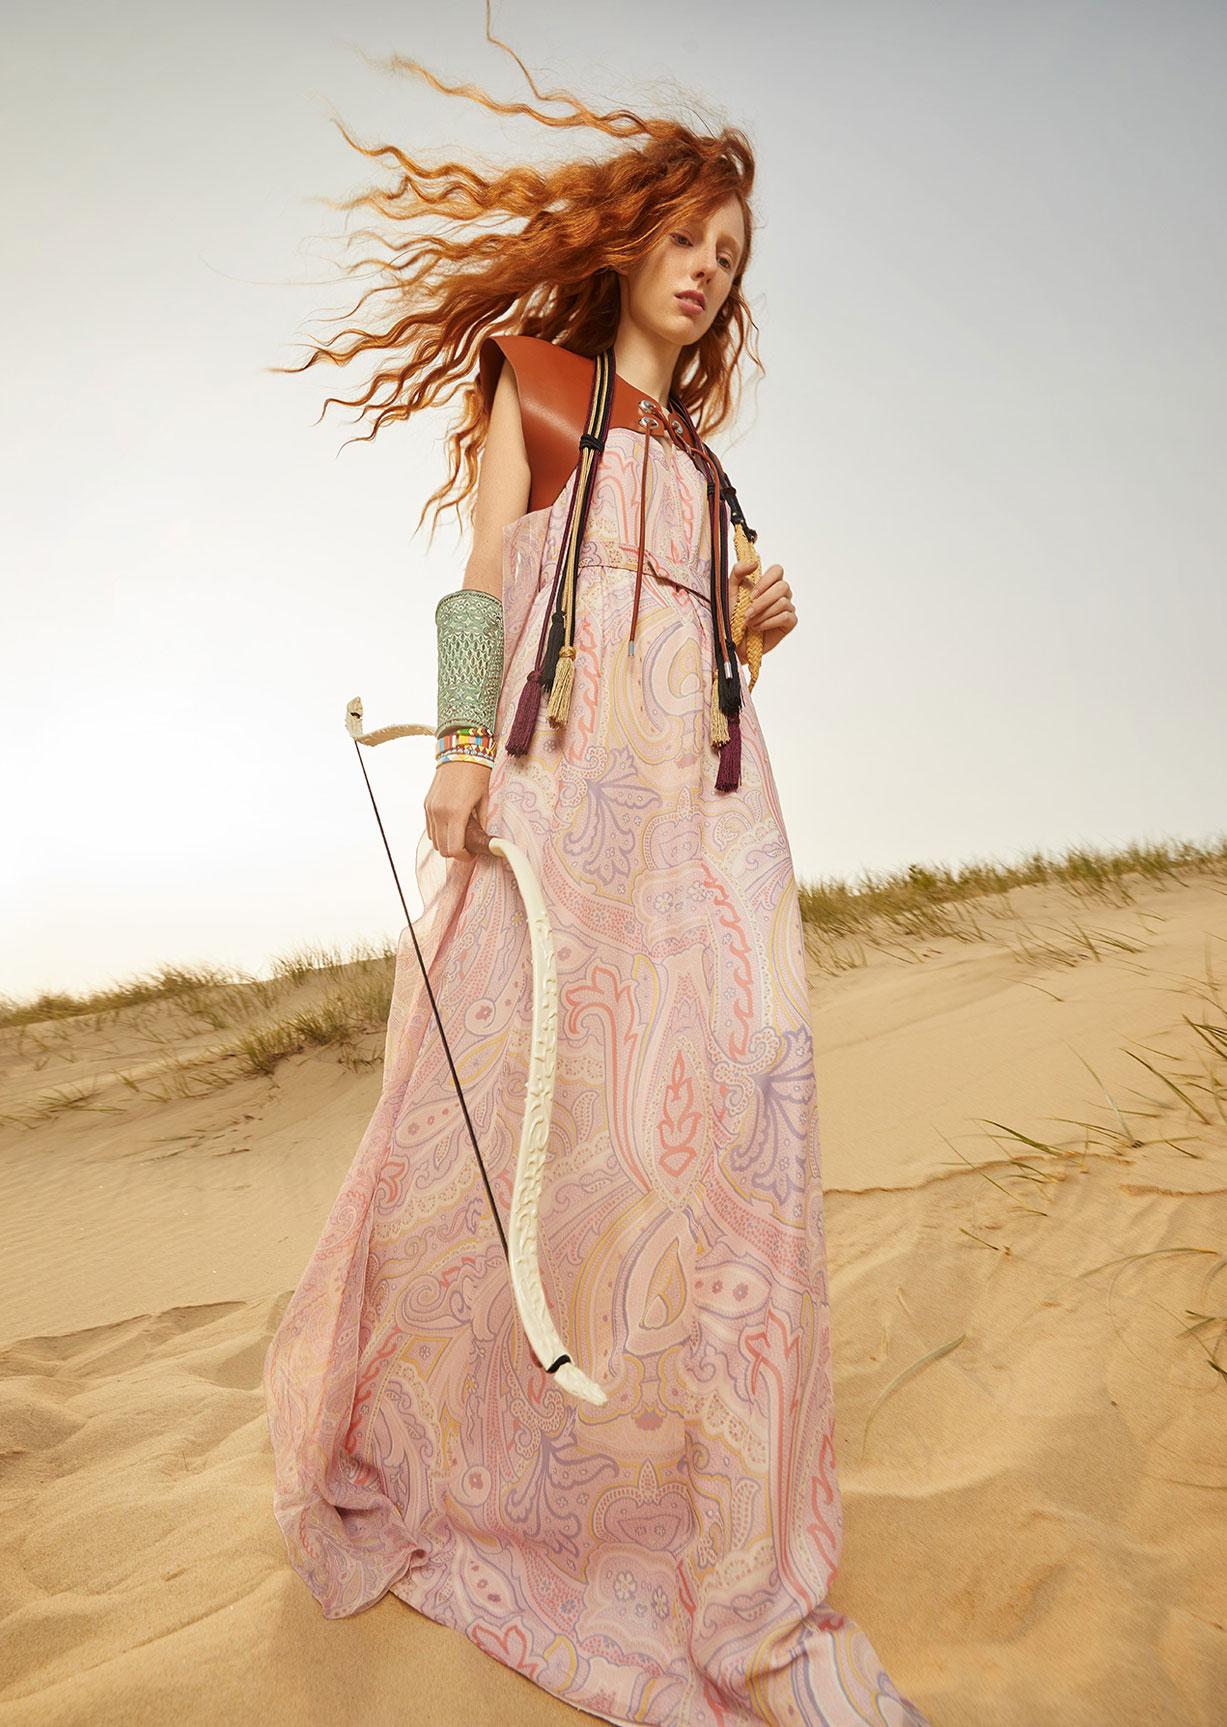 Модный маскарад в журнале Grazia / фото 02